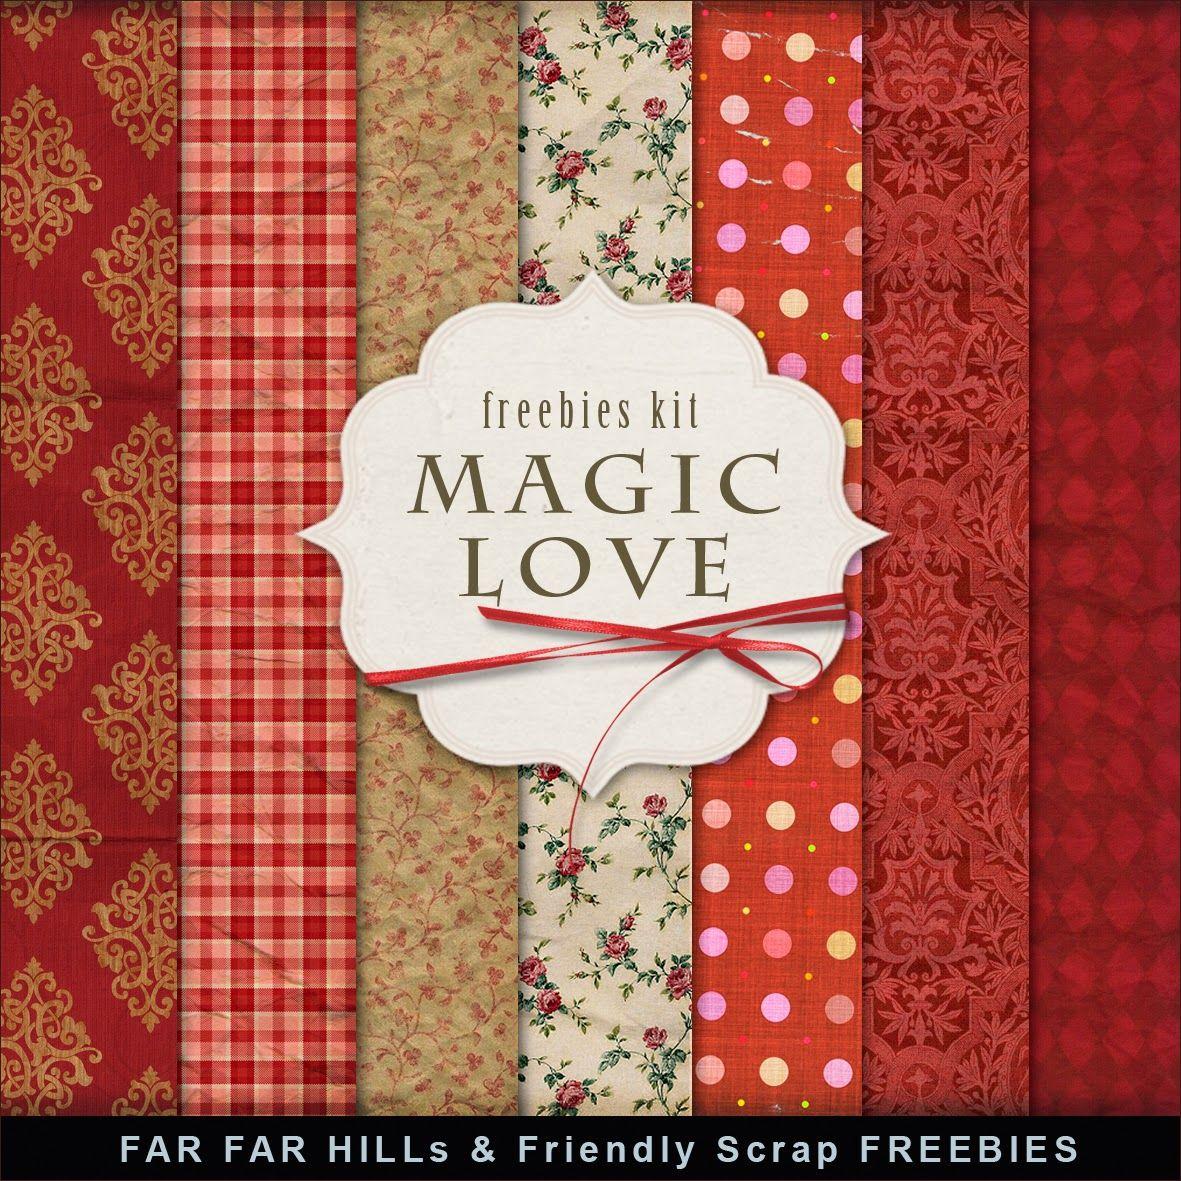 New Freebies Kit of Background - Magic Love